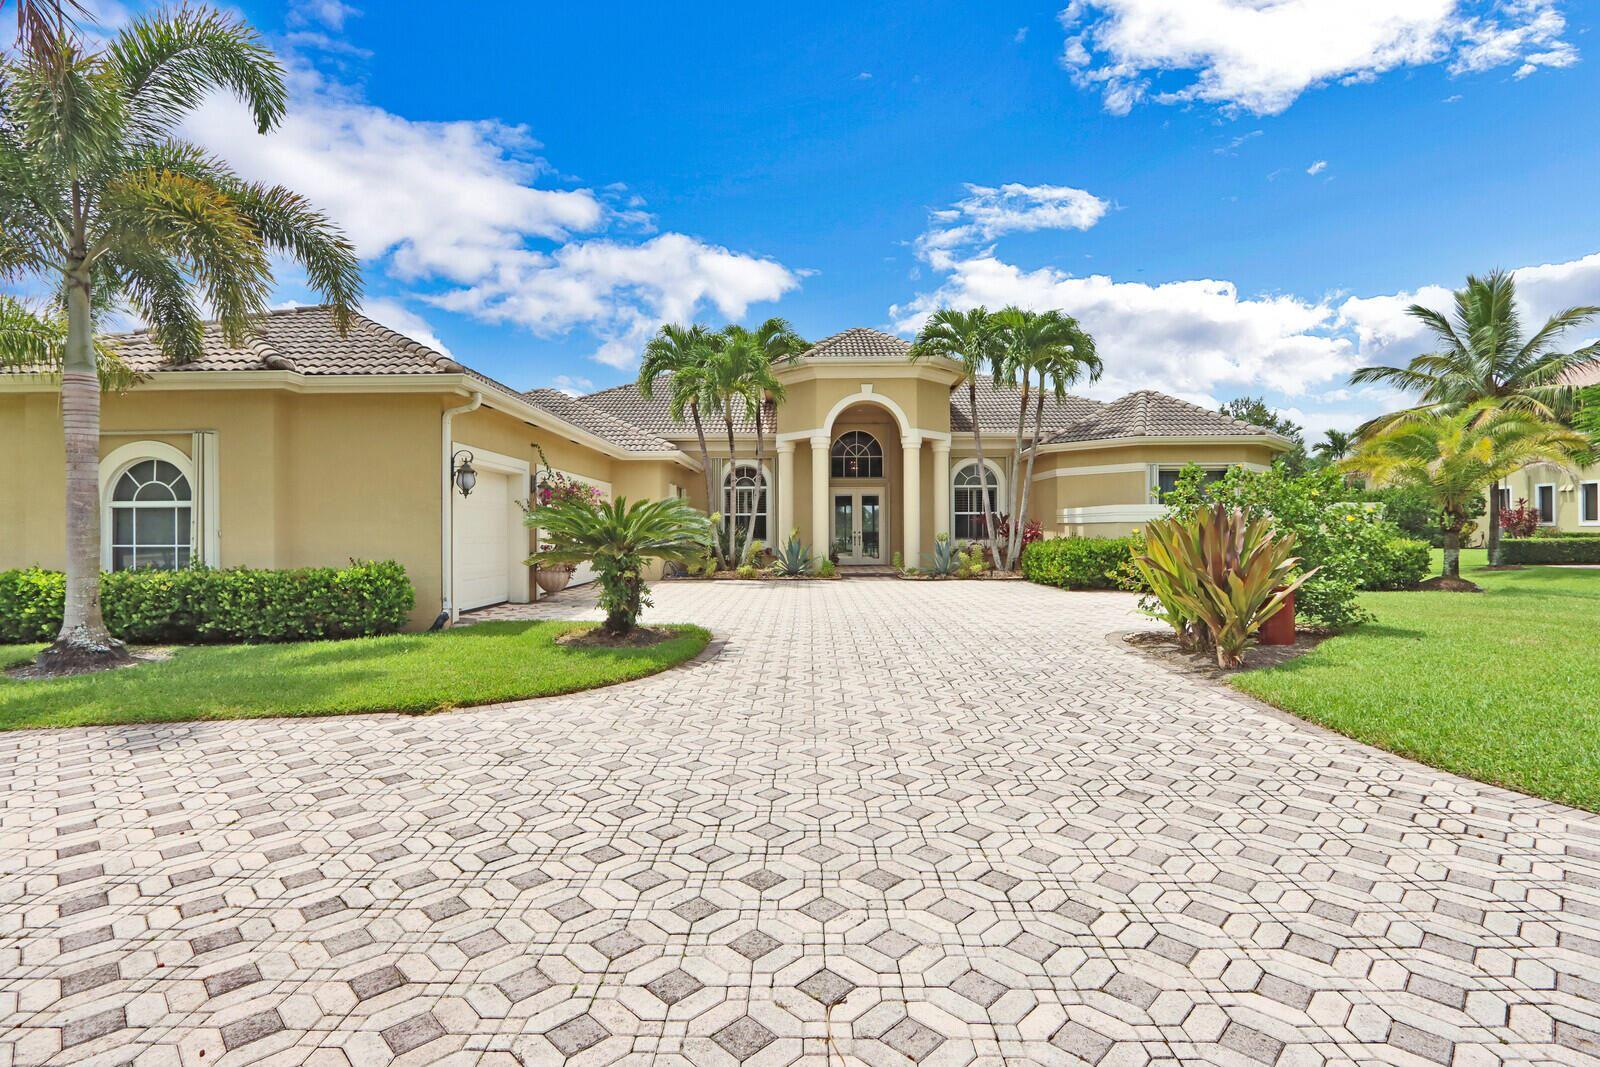 7631 Woodsmuir Drive, Palm Beach Gardens, FL 33412 - MLS#: RX-10741575